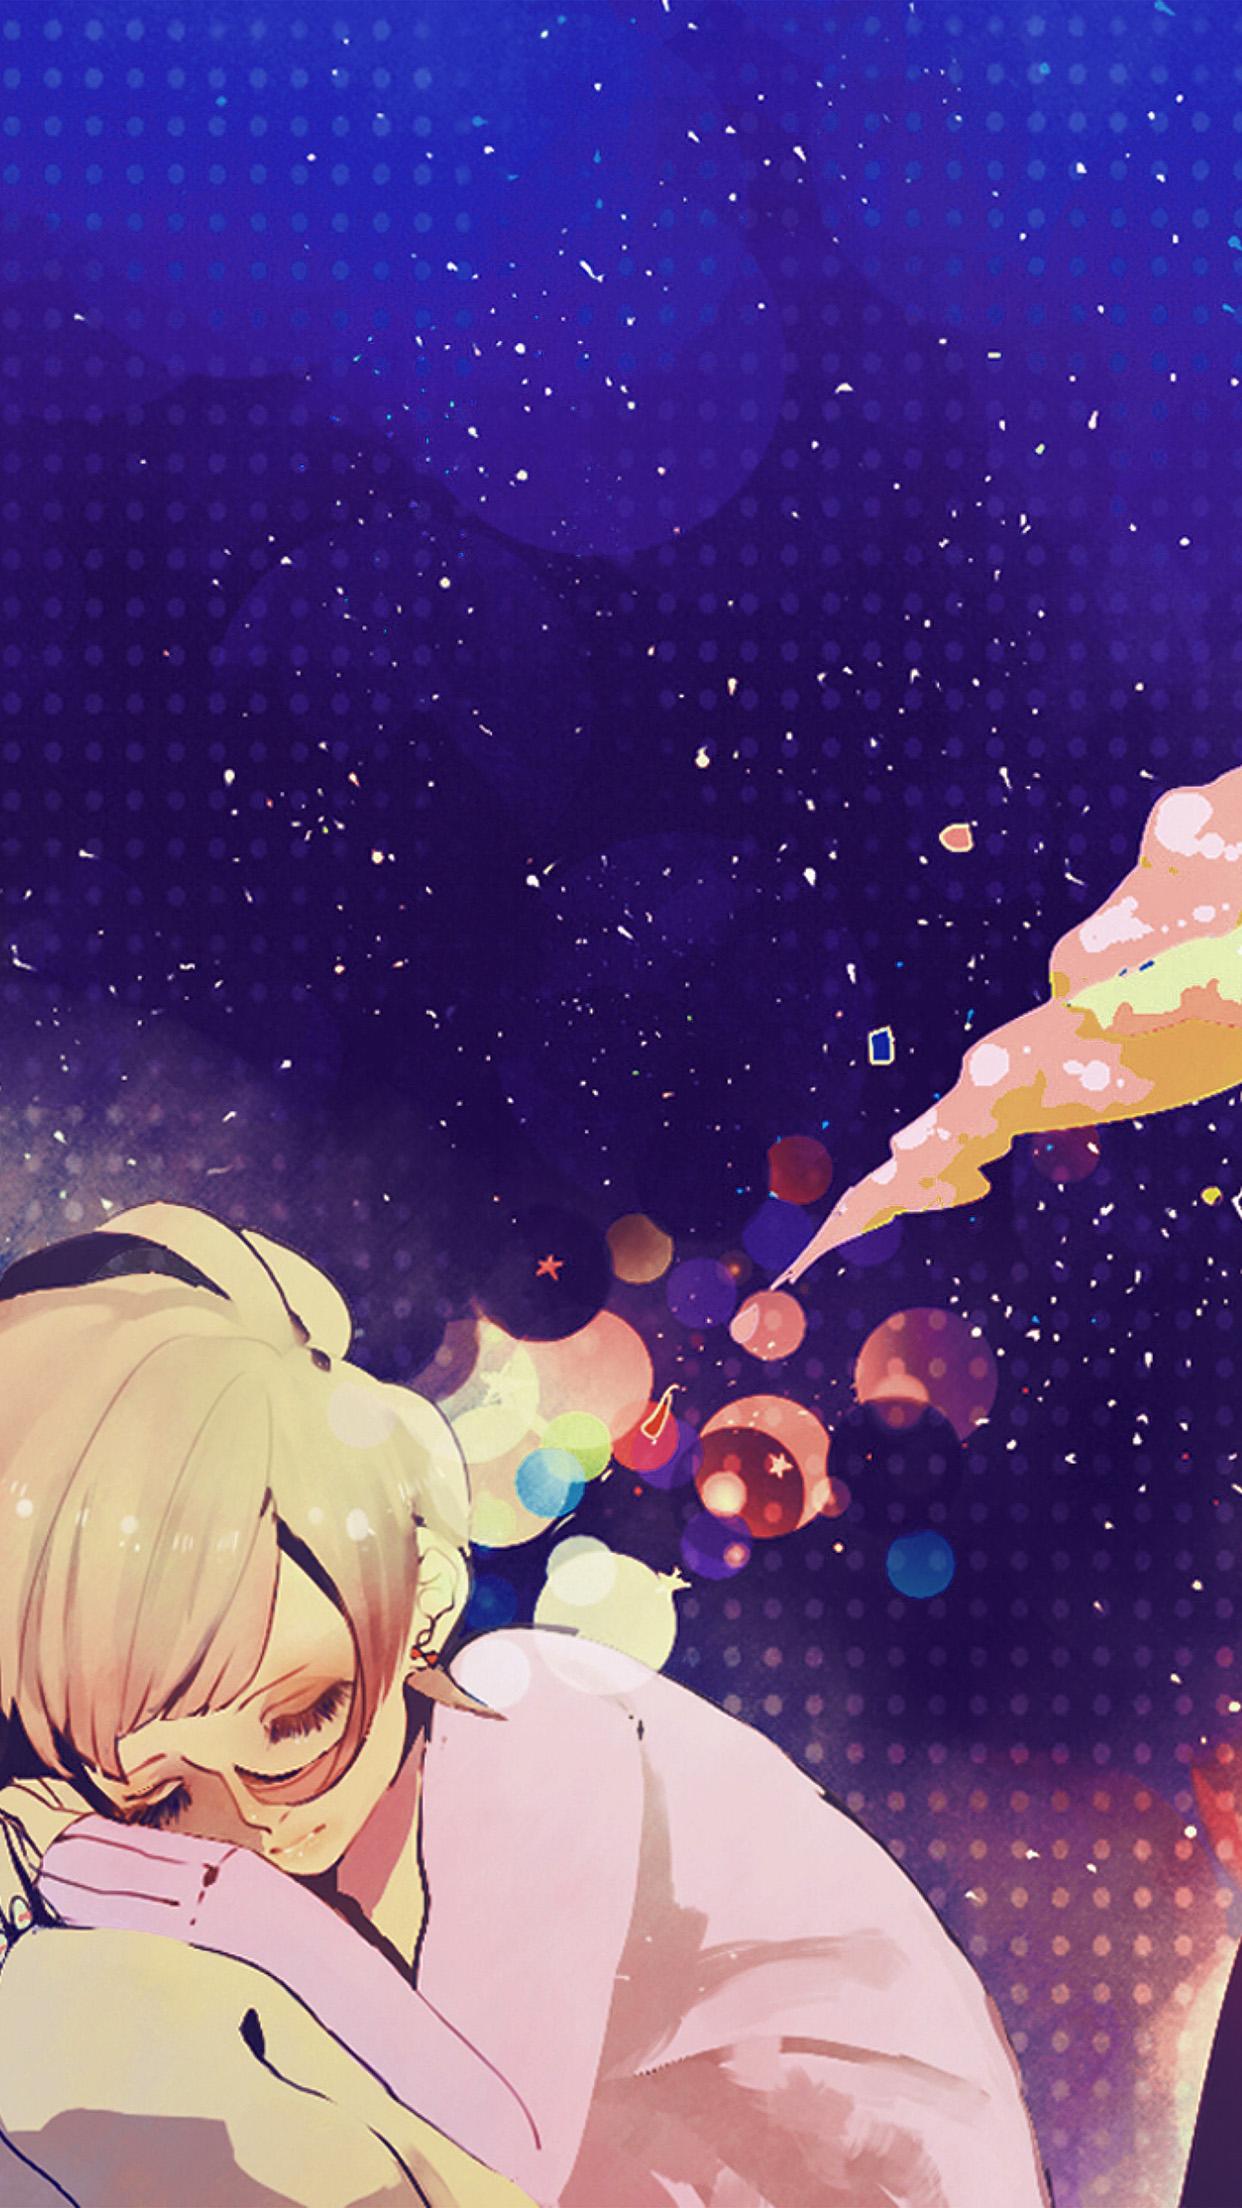 Aq37 Sleeping Girl Anime Art Illustration Blue Wallpaper